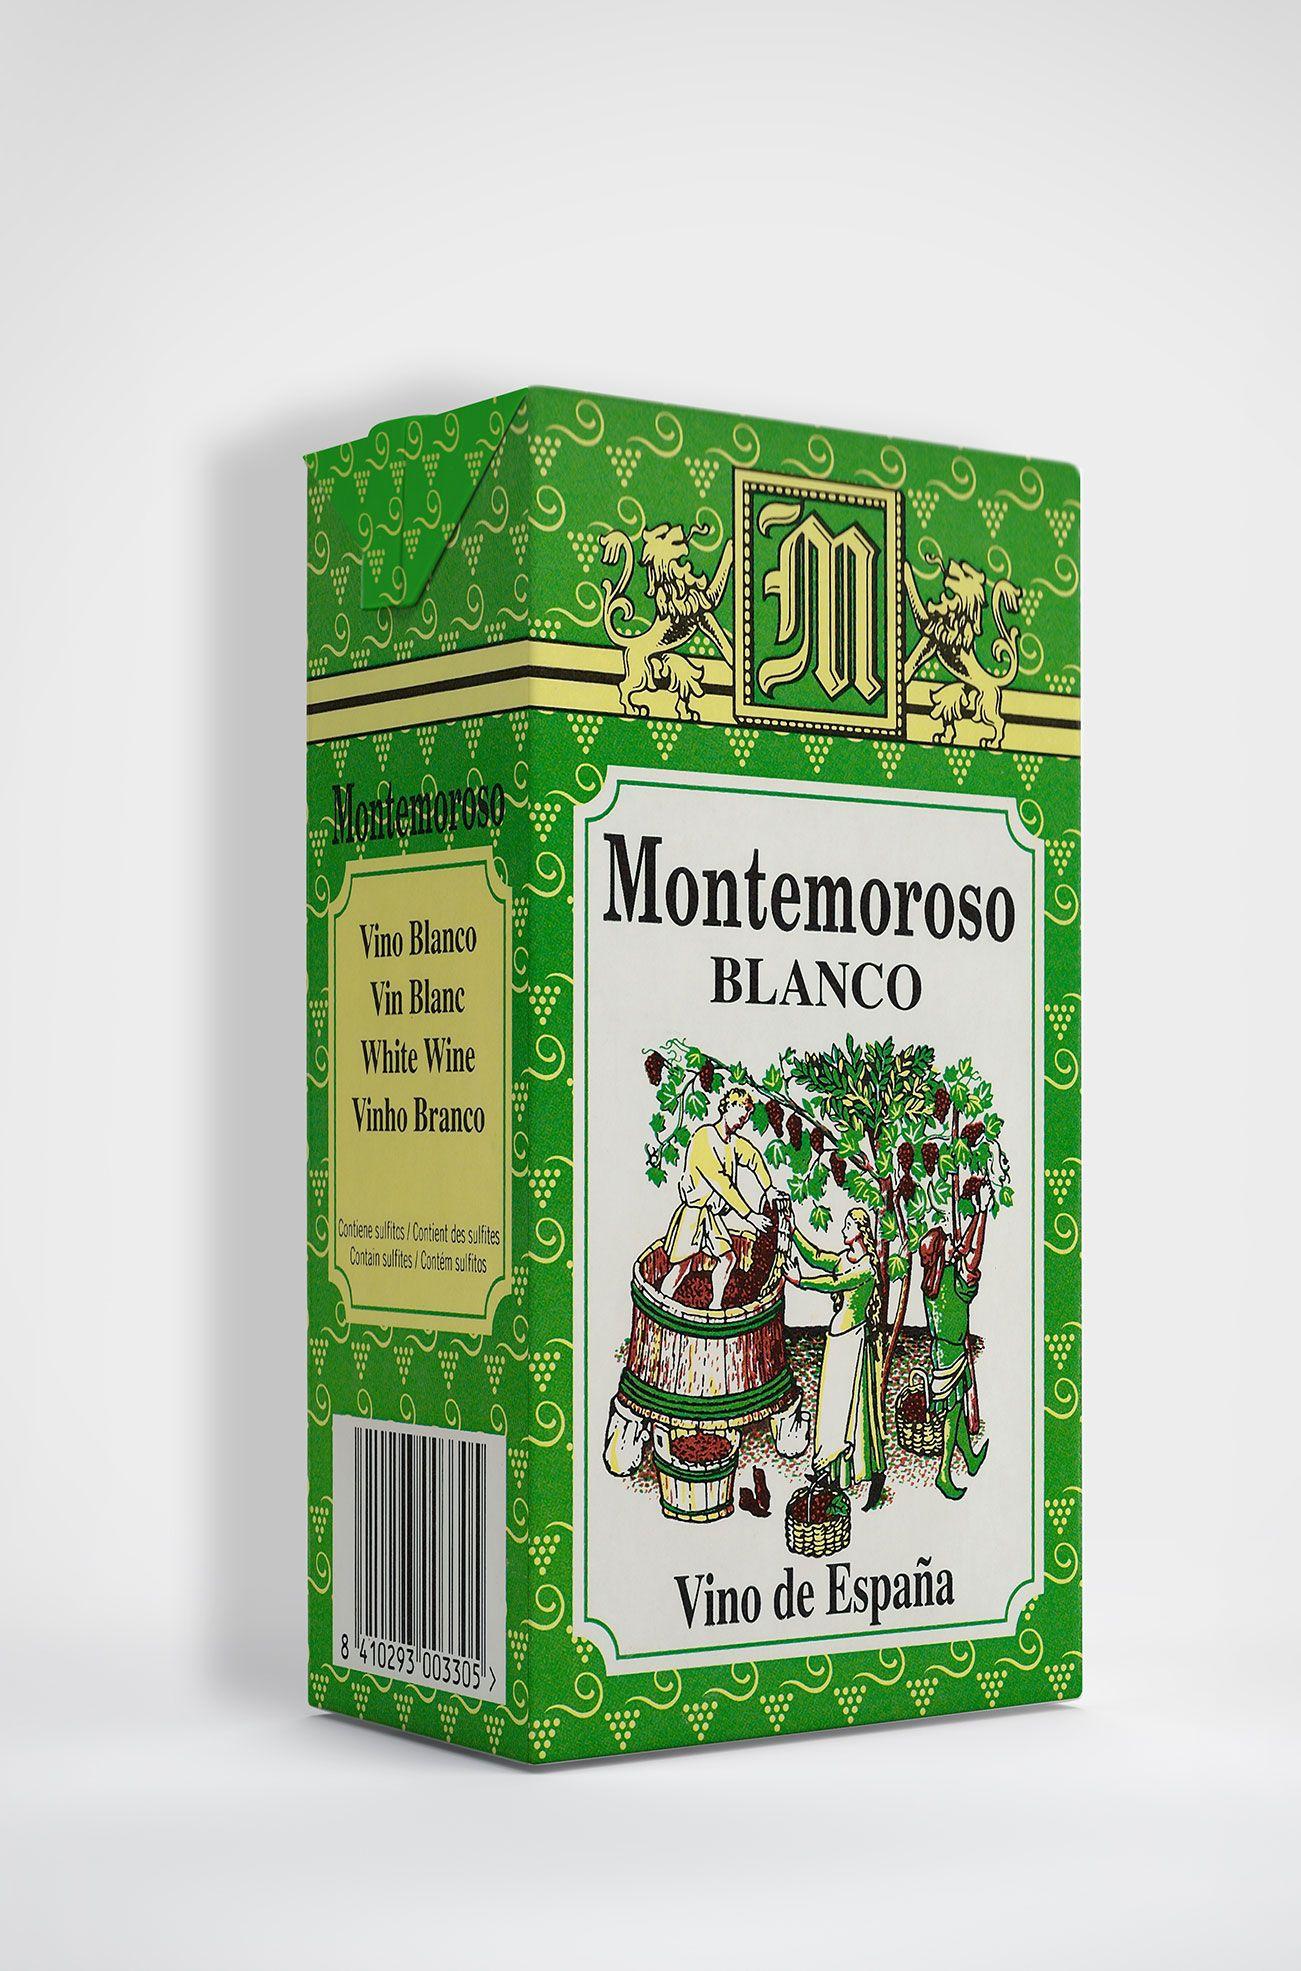 Benito Blázquez - Brik de Vino Montemoroso Blanco